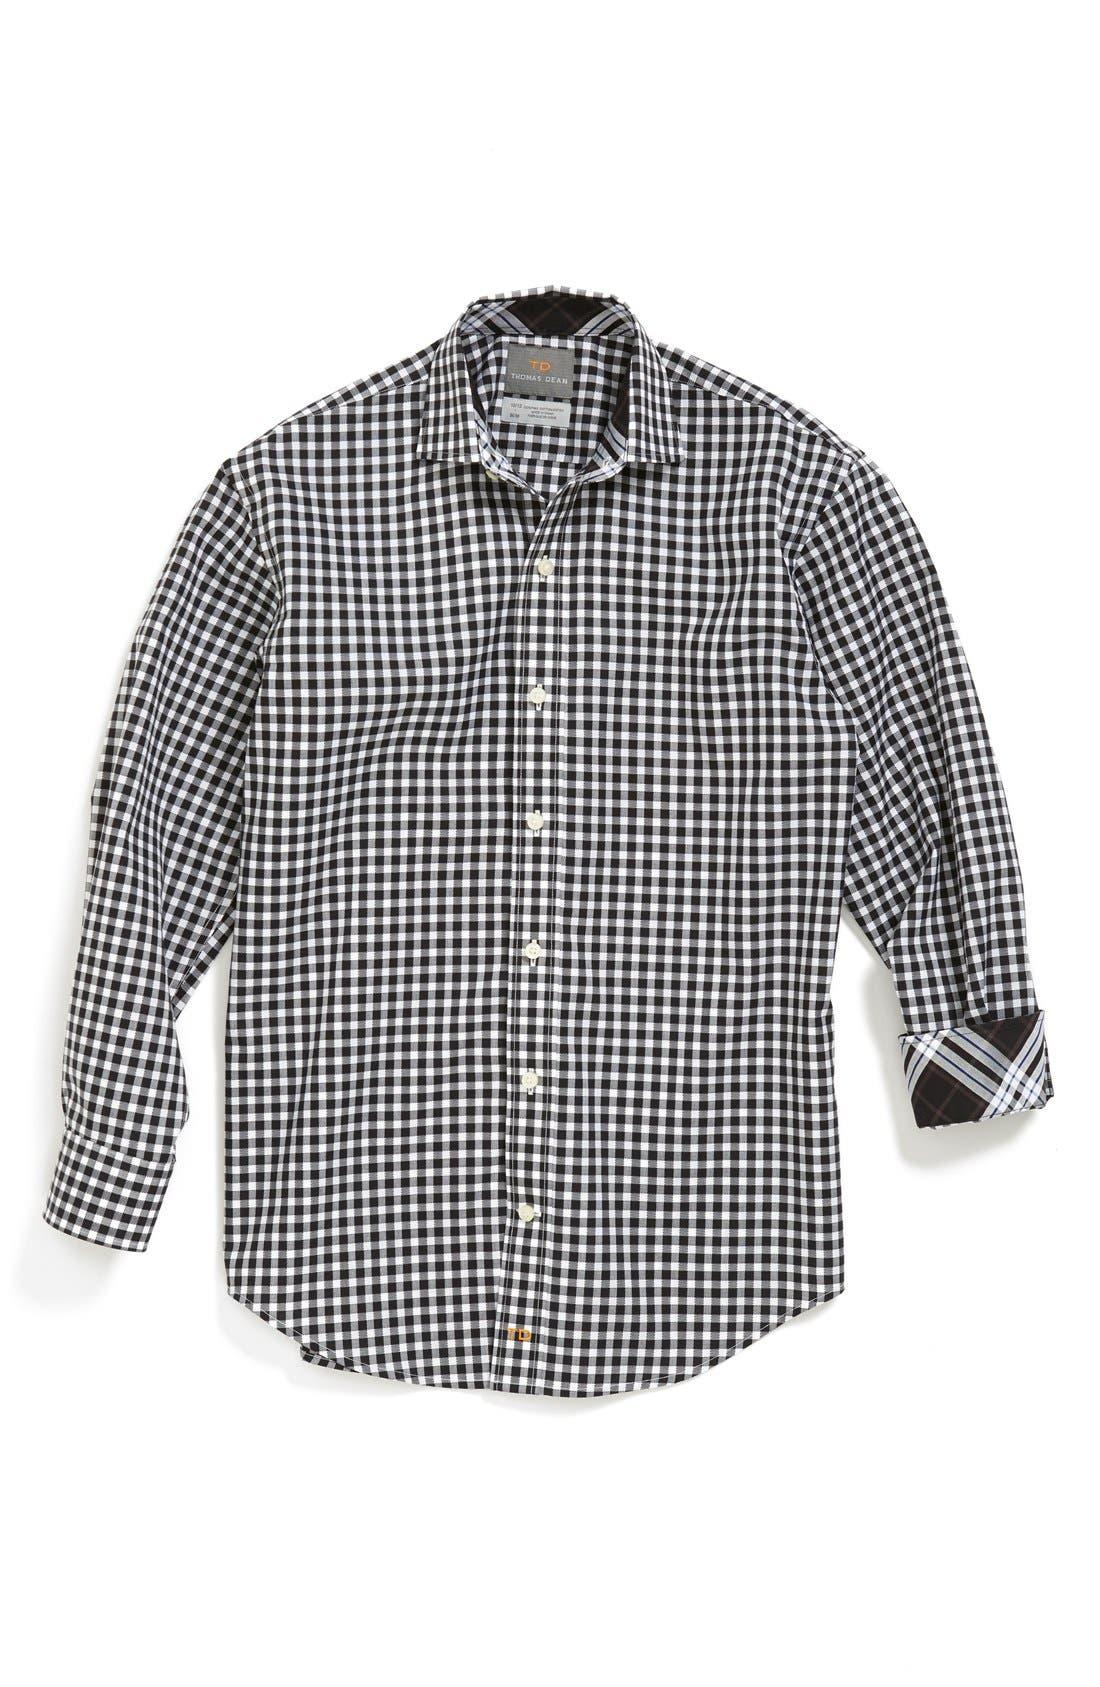 Alternate Image 1 Selected - Thomas Dean Gingham Cotton Poplin Dress Shirt (Big Boys)